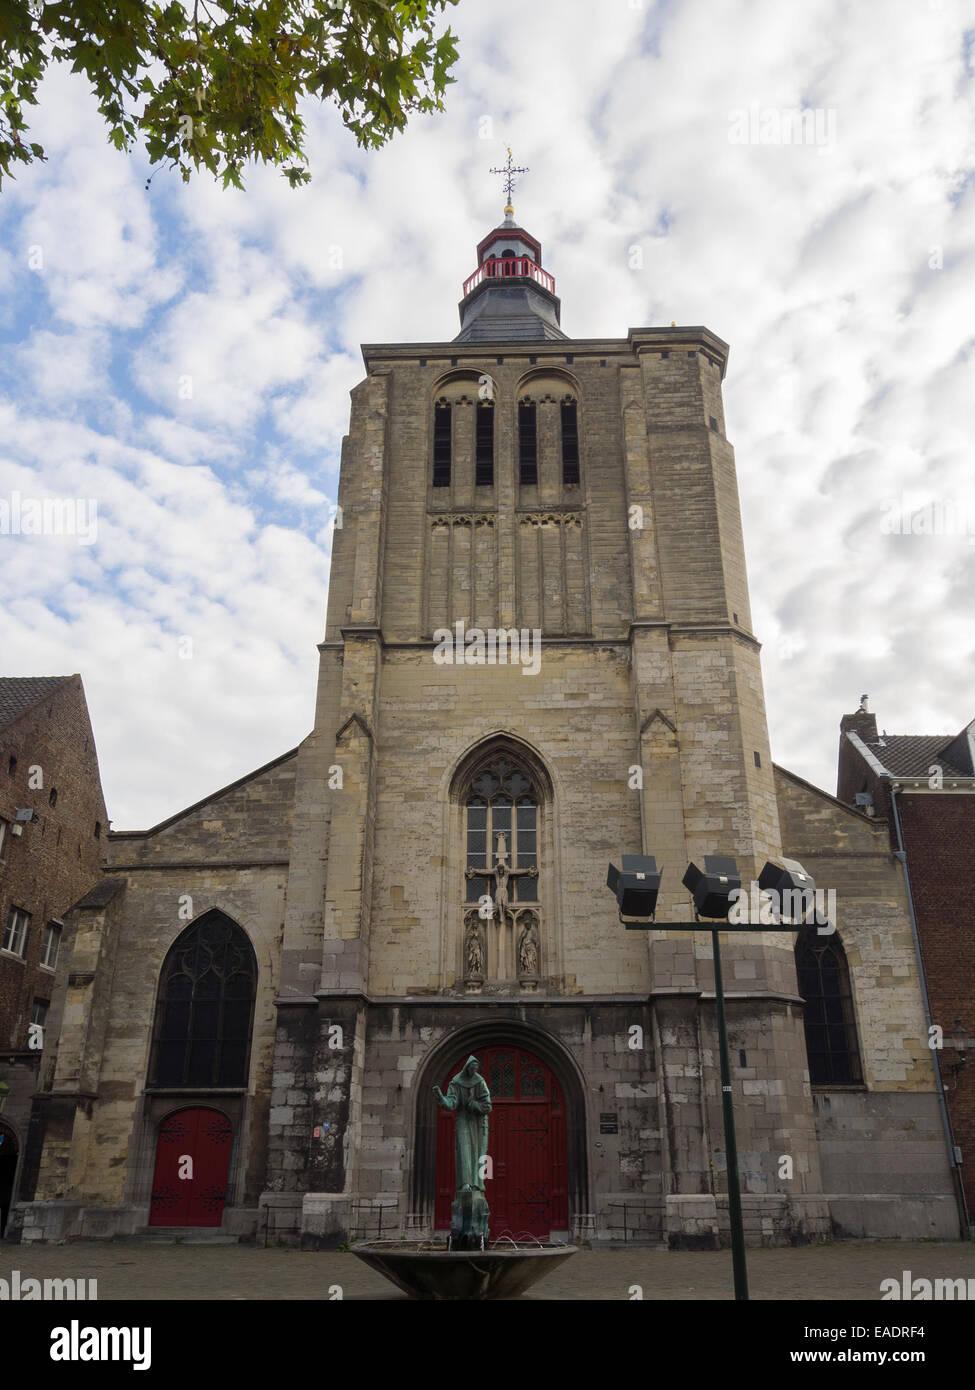 St matthias church in maastricht the netherlands europe - Maastricht mobel ...